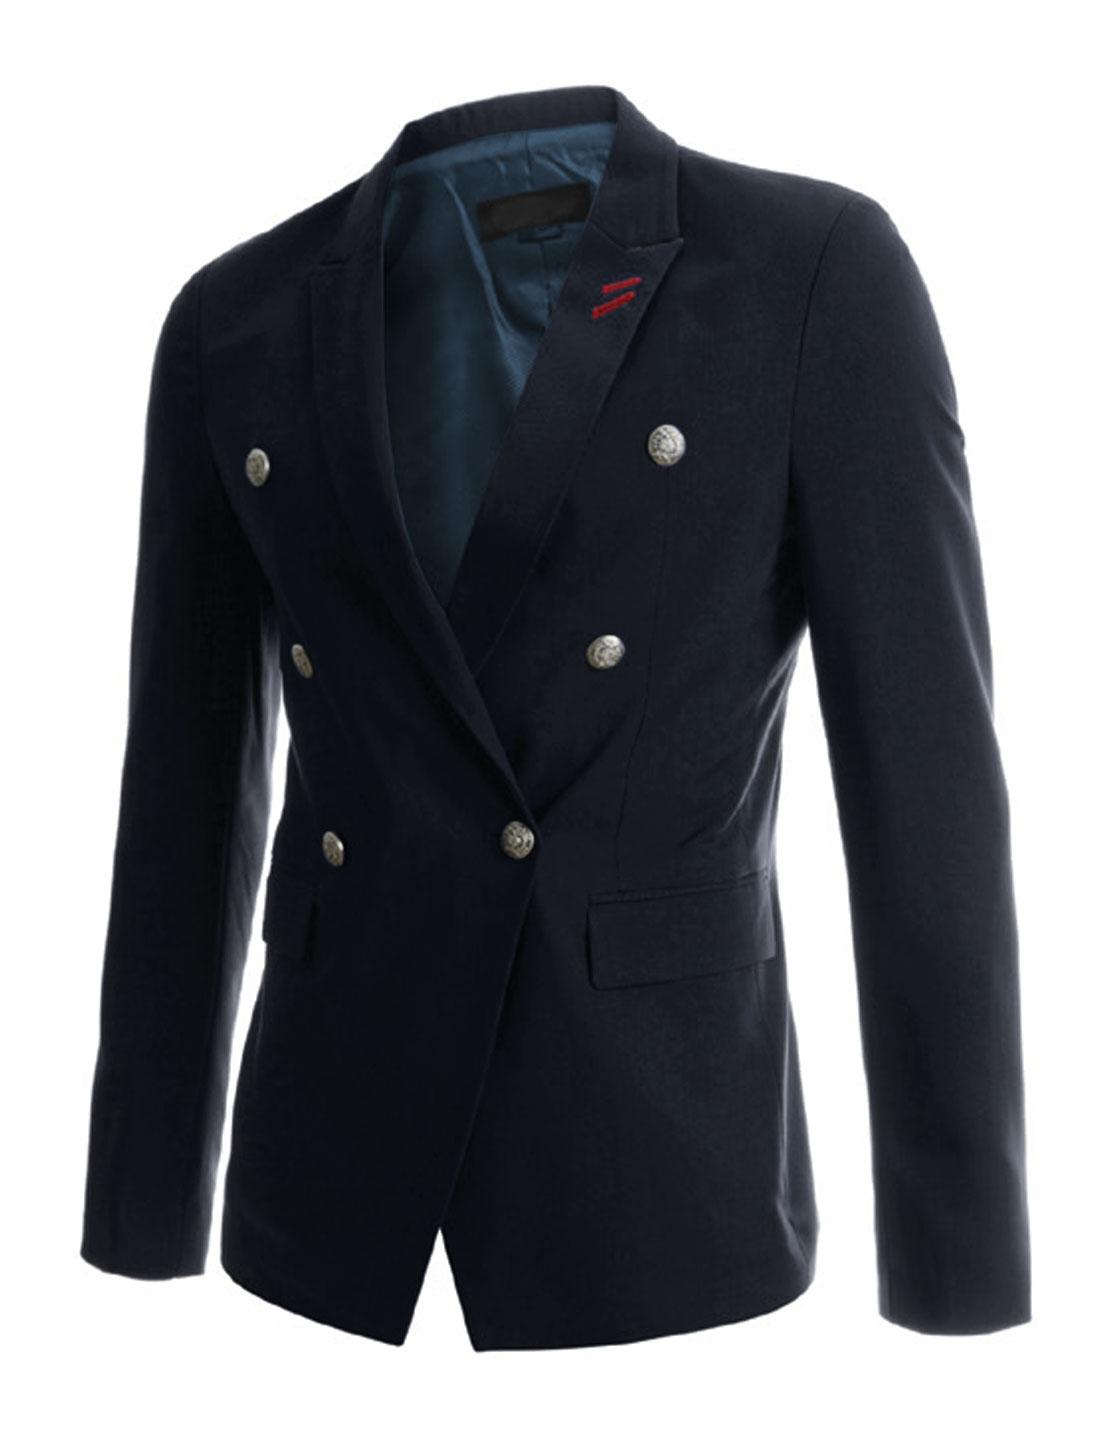 Men Long Sleeve Peaked Lapel Single Breasted Blazer Jacket Navy Blue M